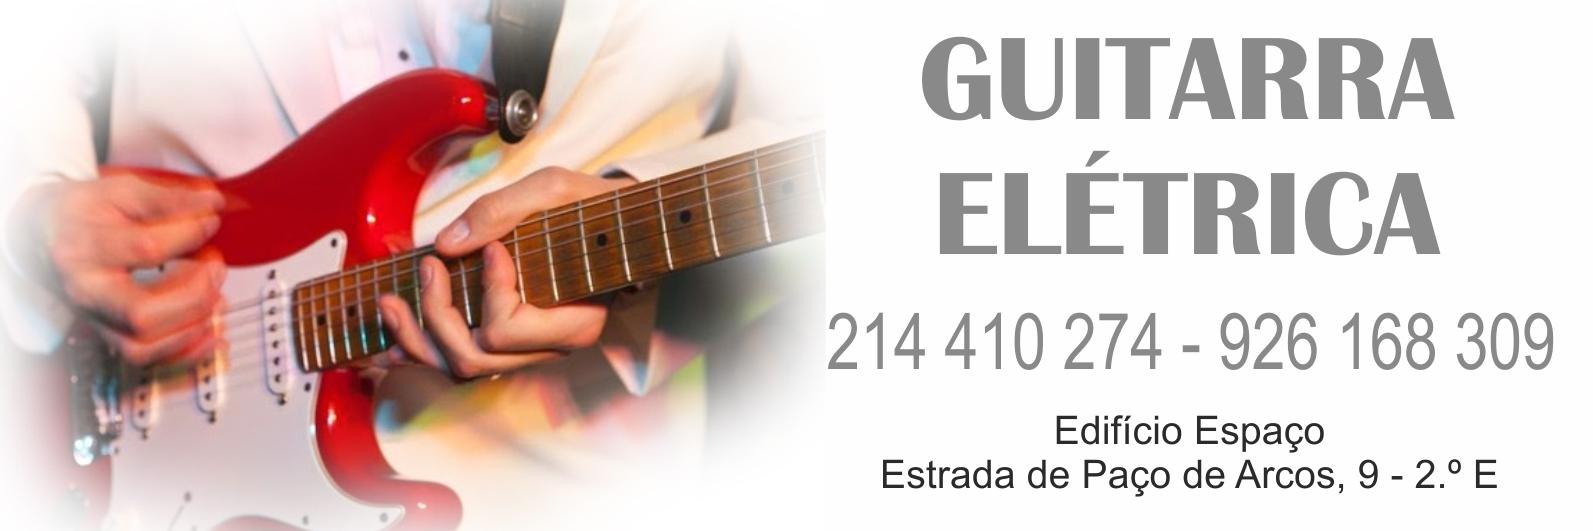 slider 05 - GUITARRA ELÉTRICA